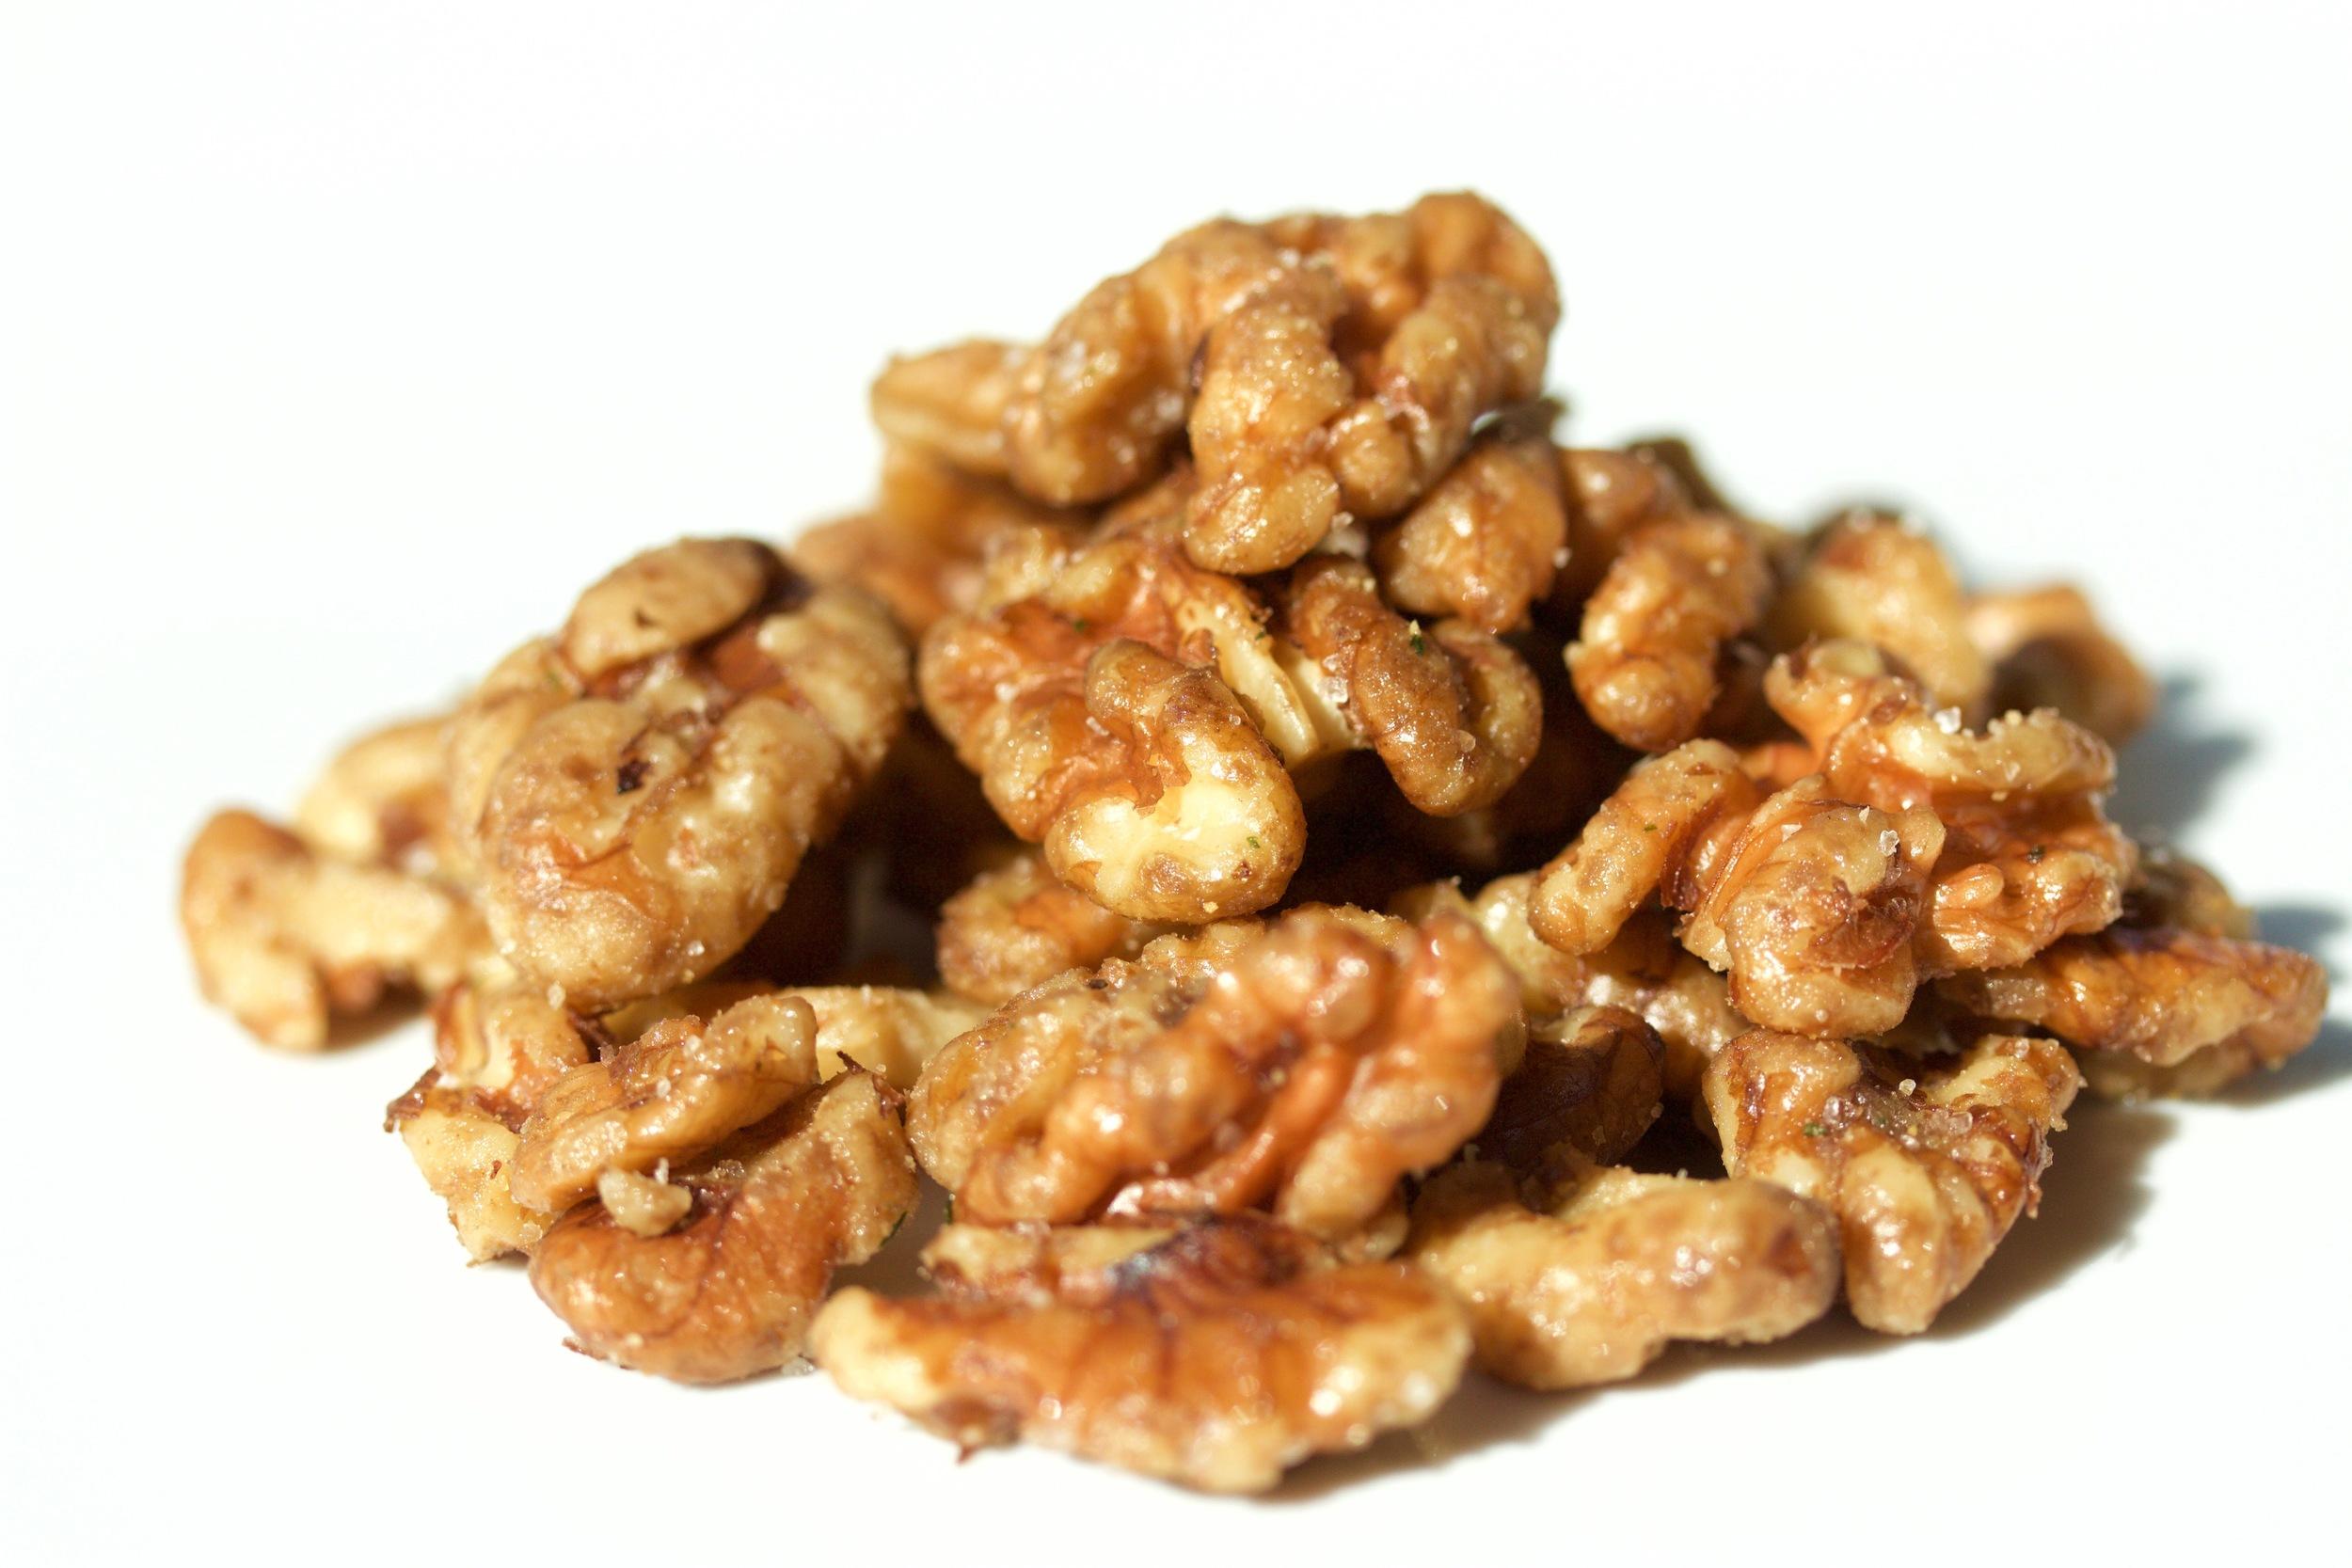 garlic salty walnuts